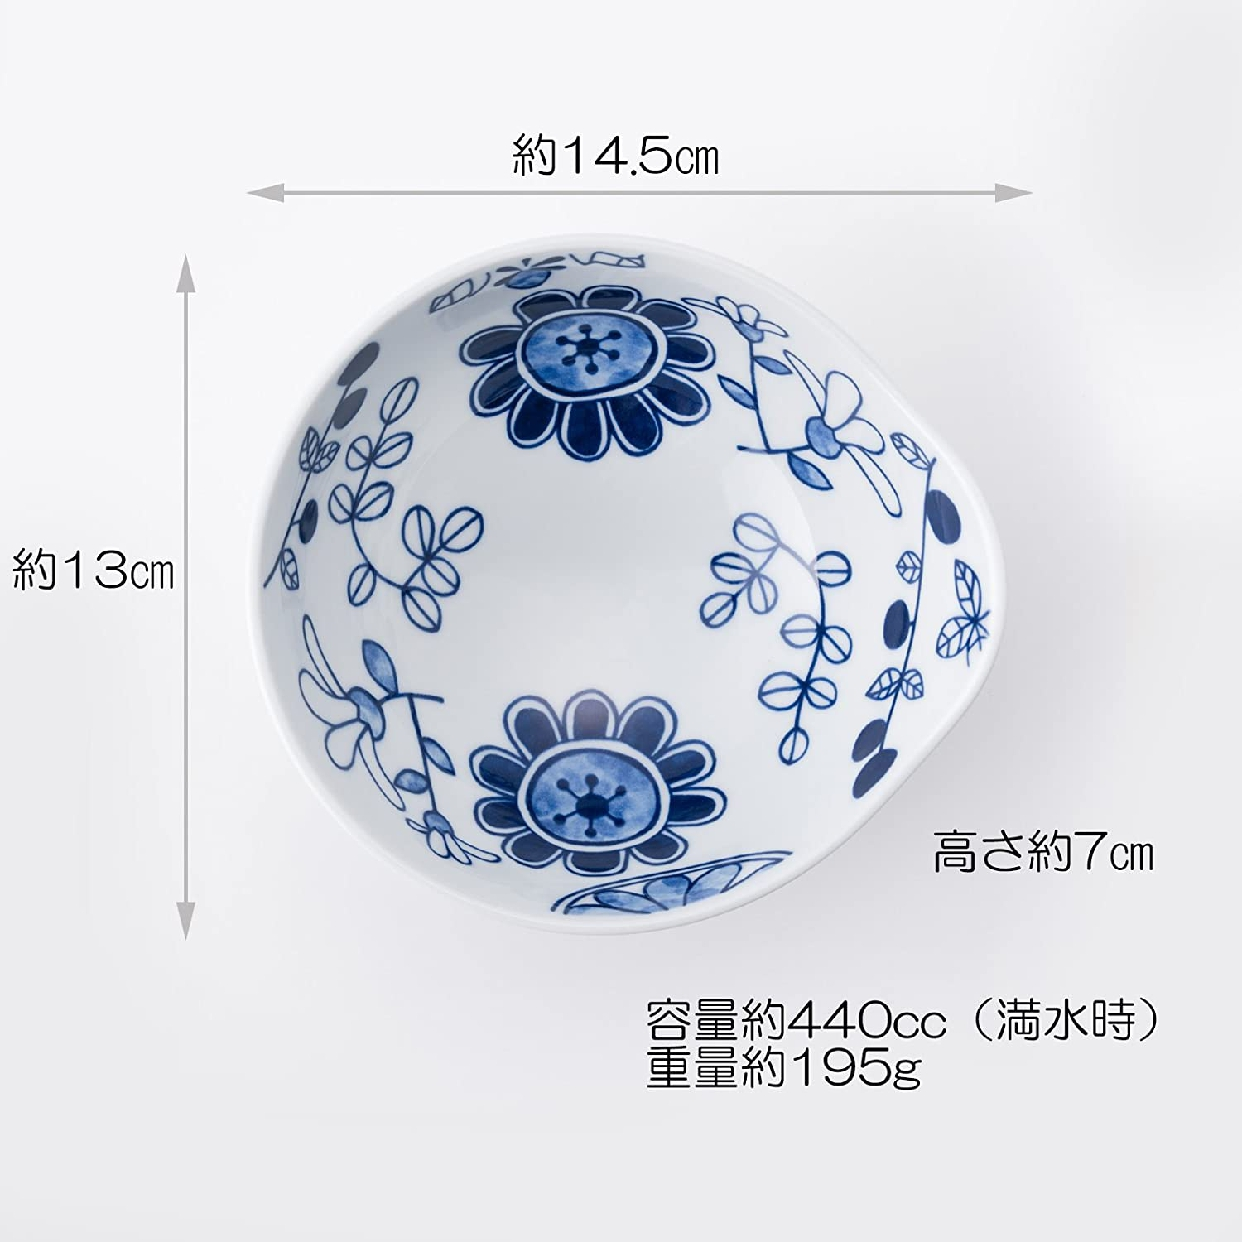 CtoC JAPAN(シートゥーシー ジャパン) 少し大きめの 持ち手つき 小鉢の商品画像2